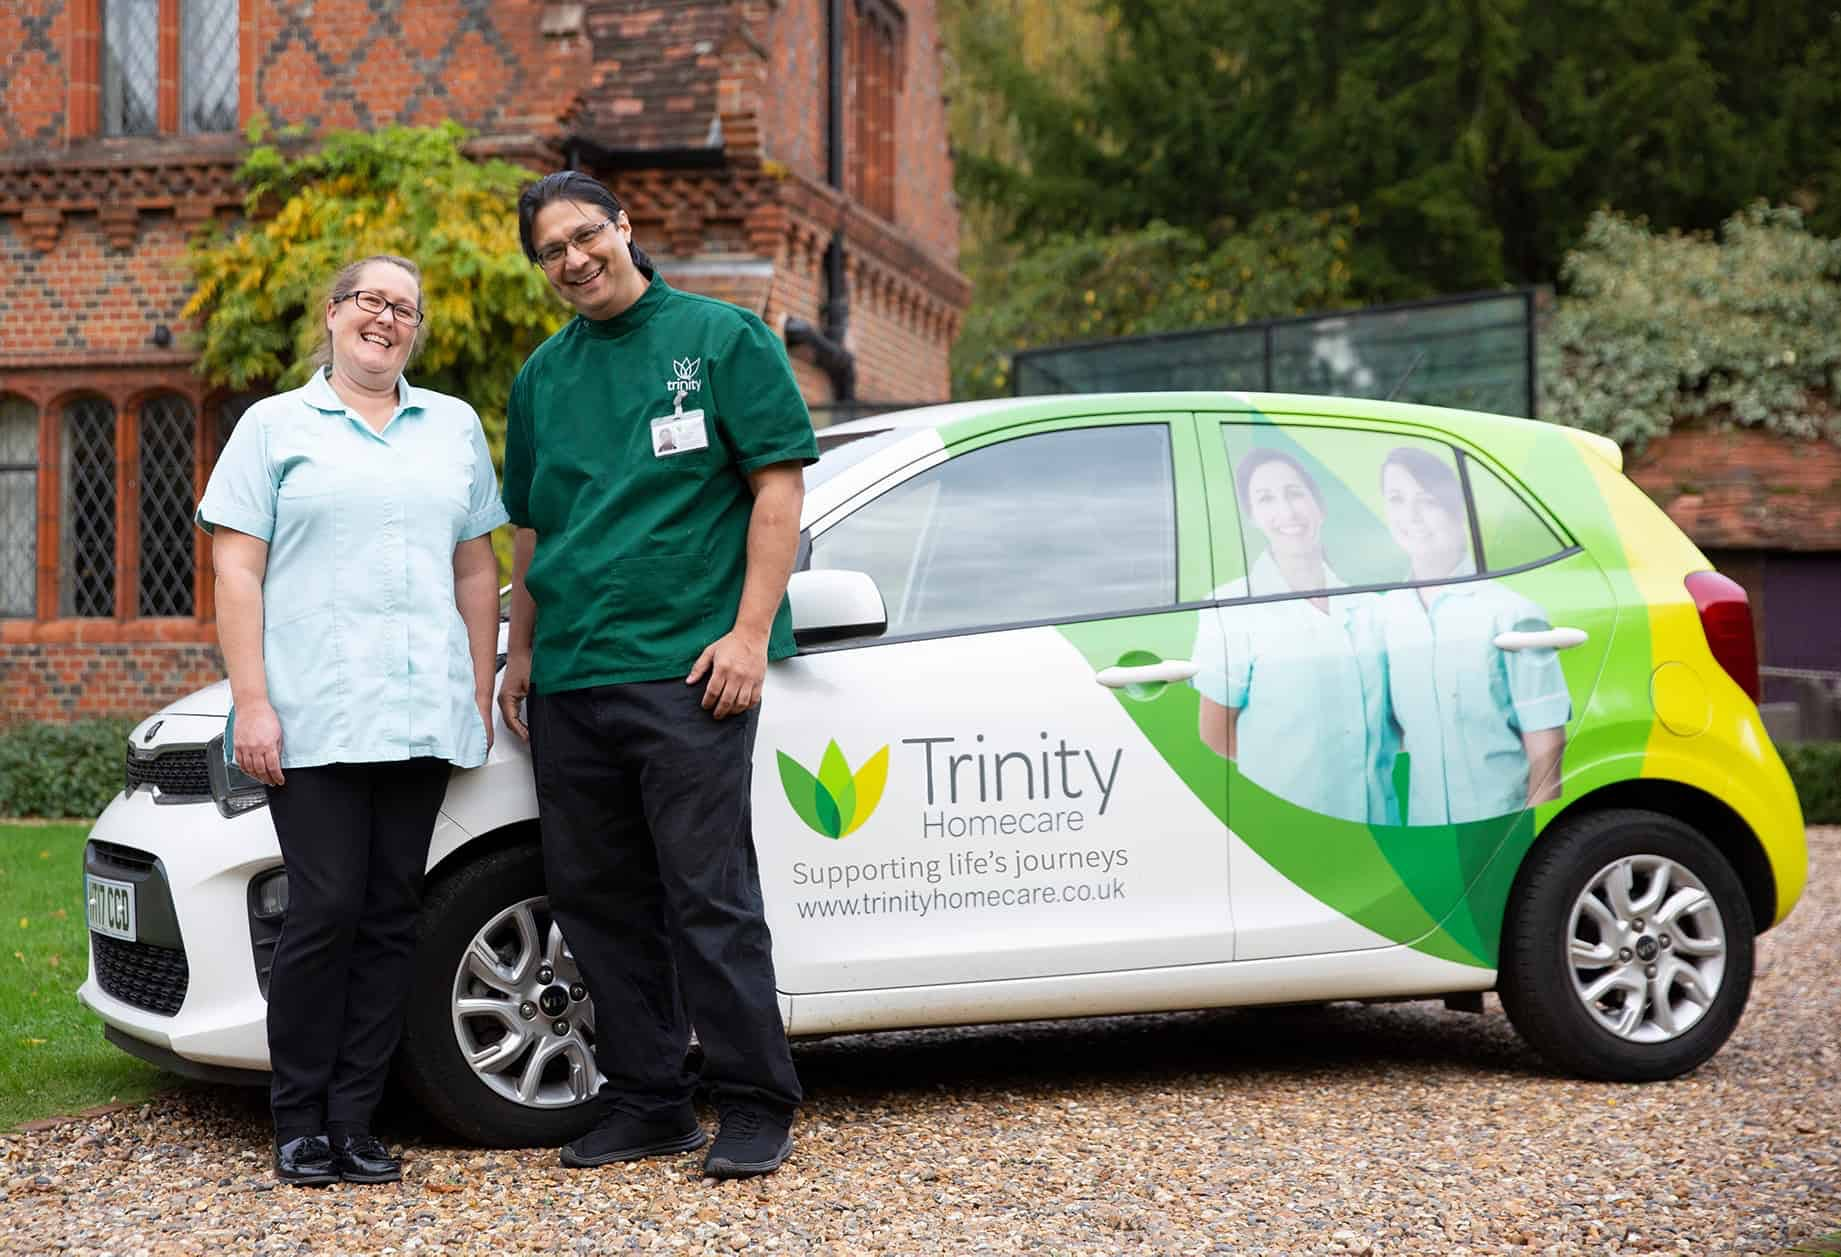 Trinity Care Staff standing next to a Trinity Homecare branded car